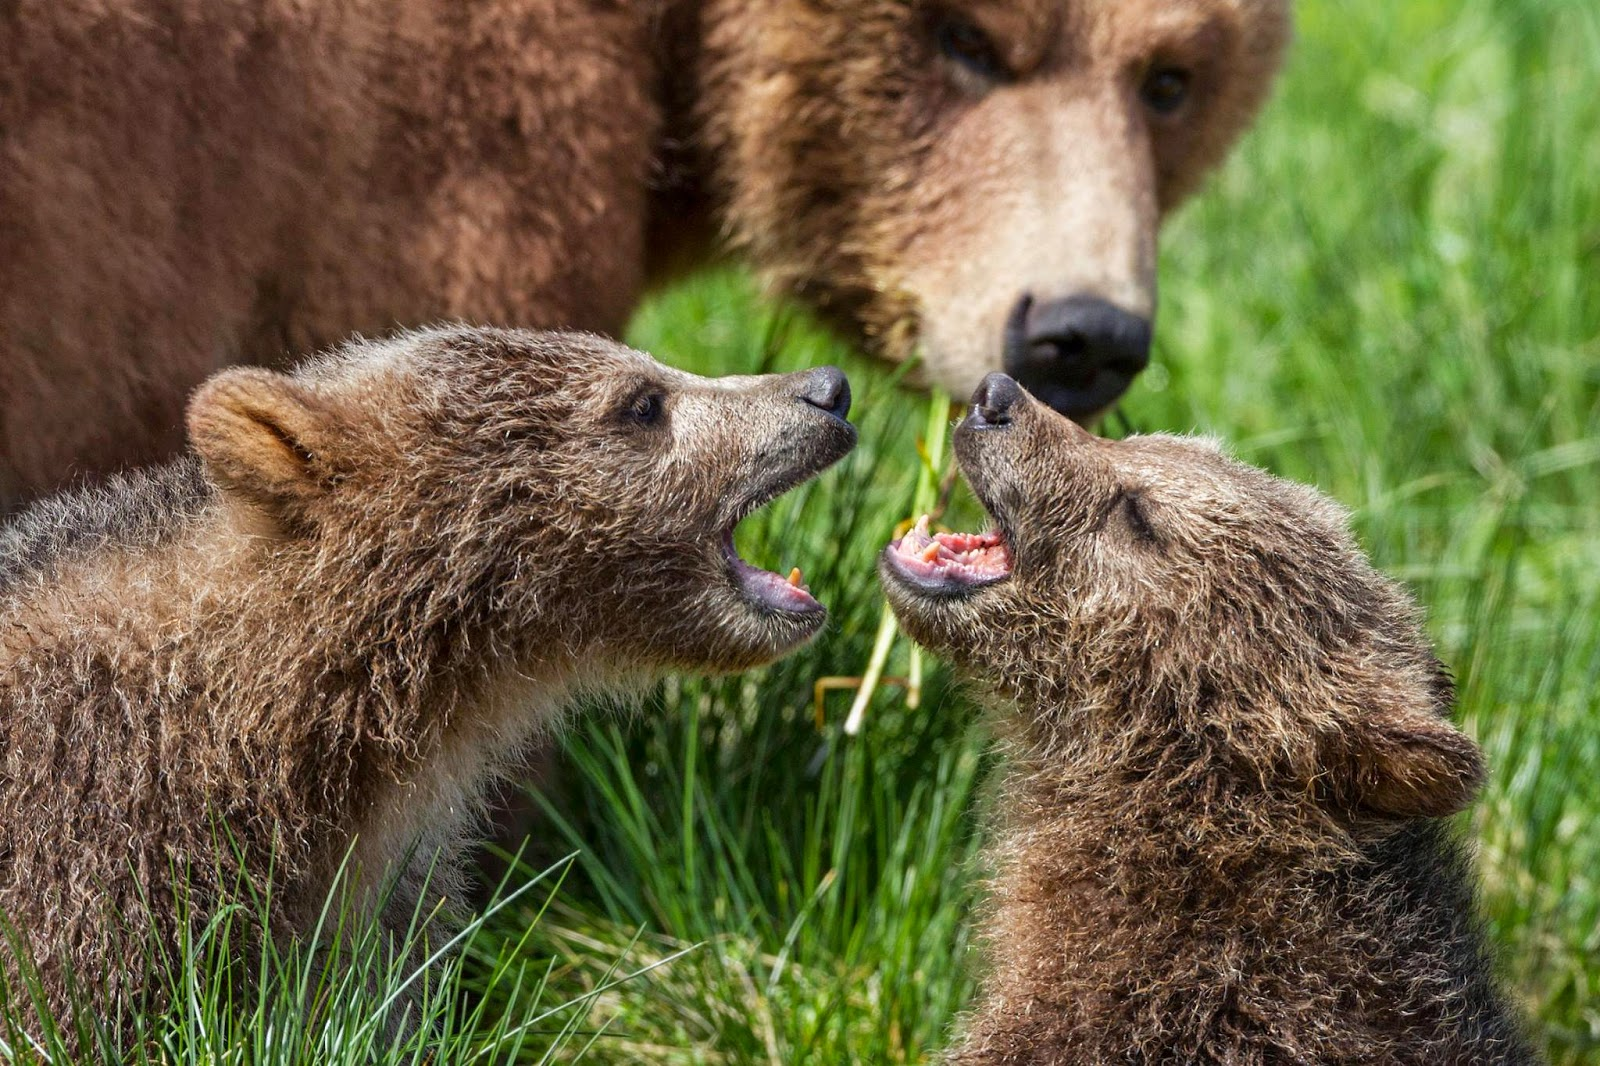 Wilmington on Movies: Bears